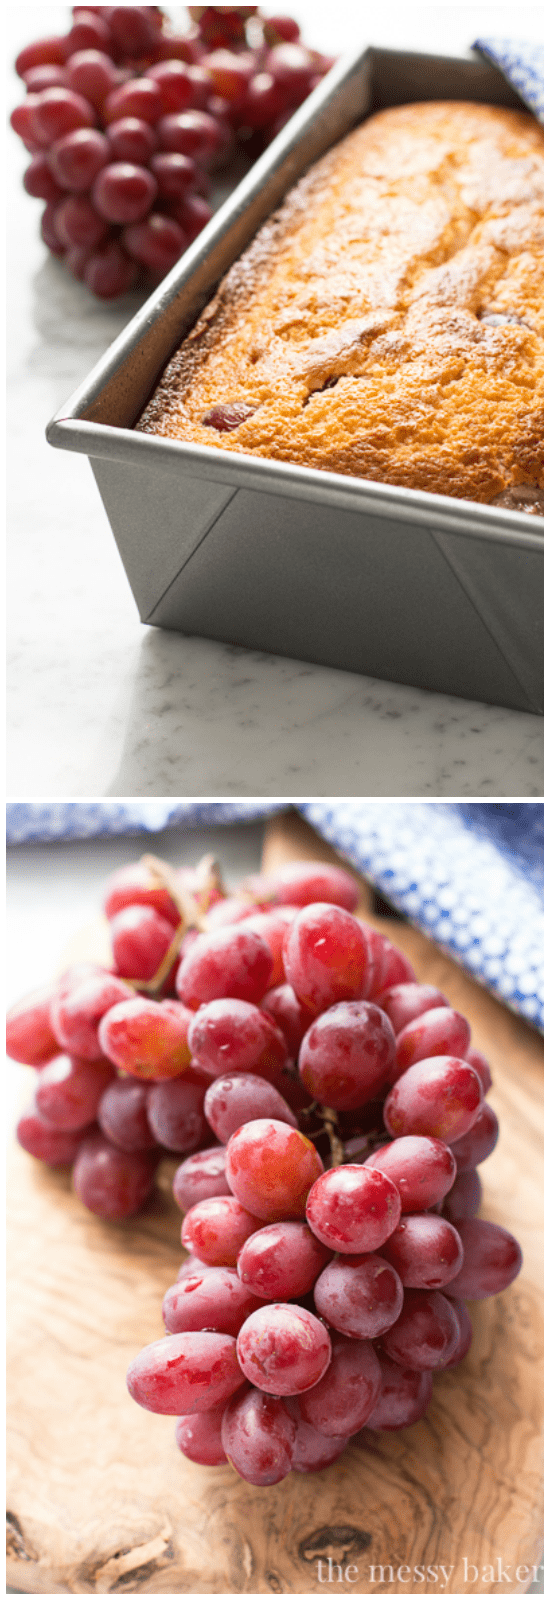 Ricotta Pound Cake with Grapes   www.themessybakerblog.com